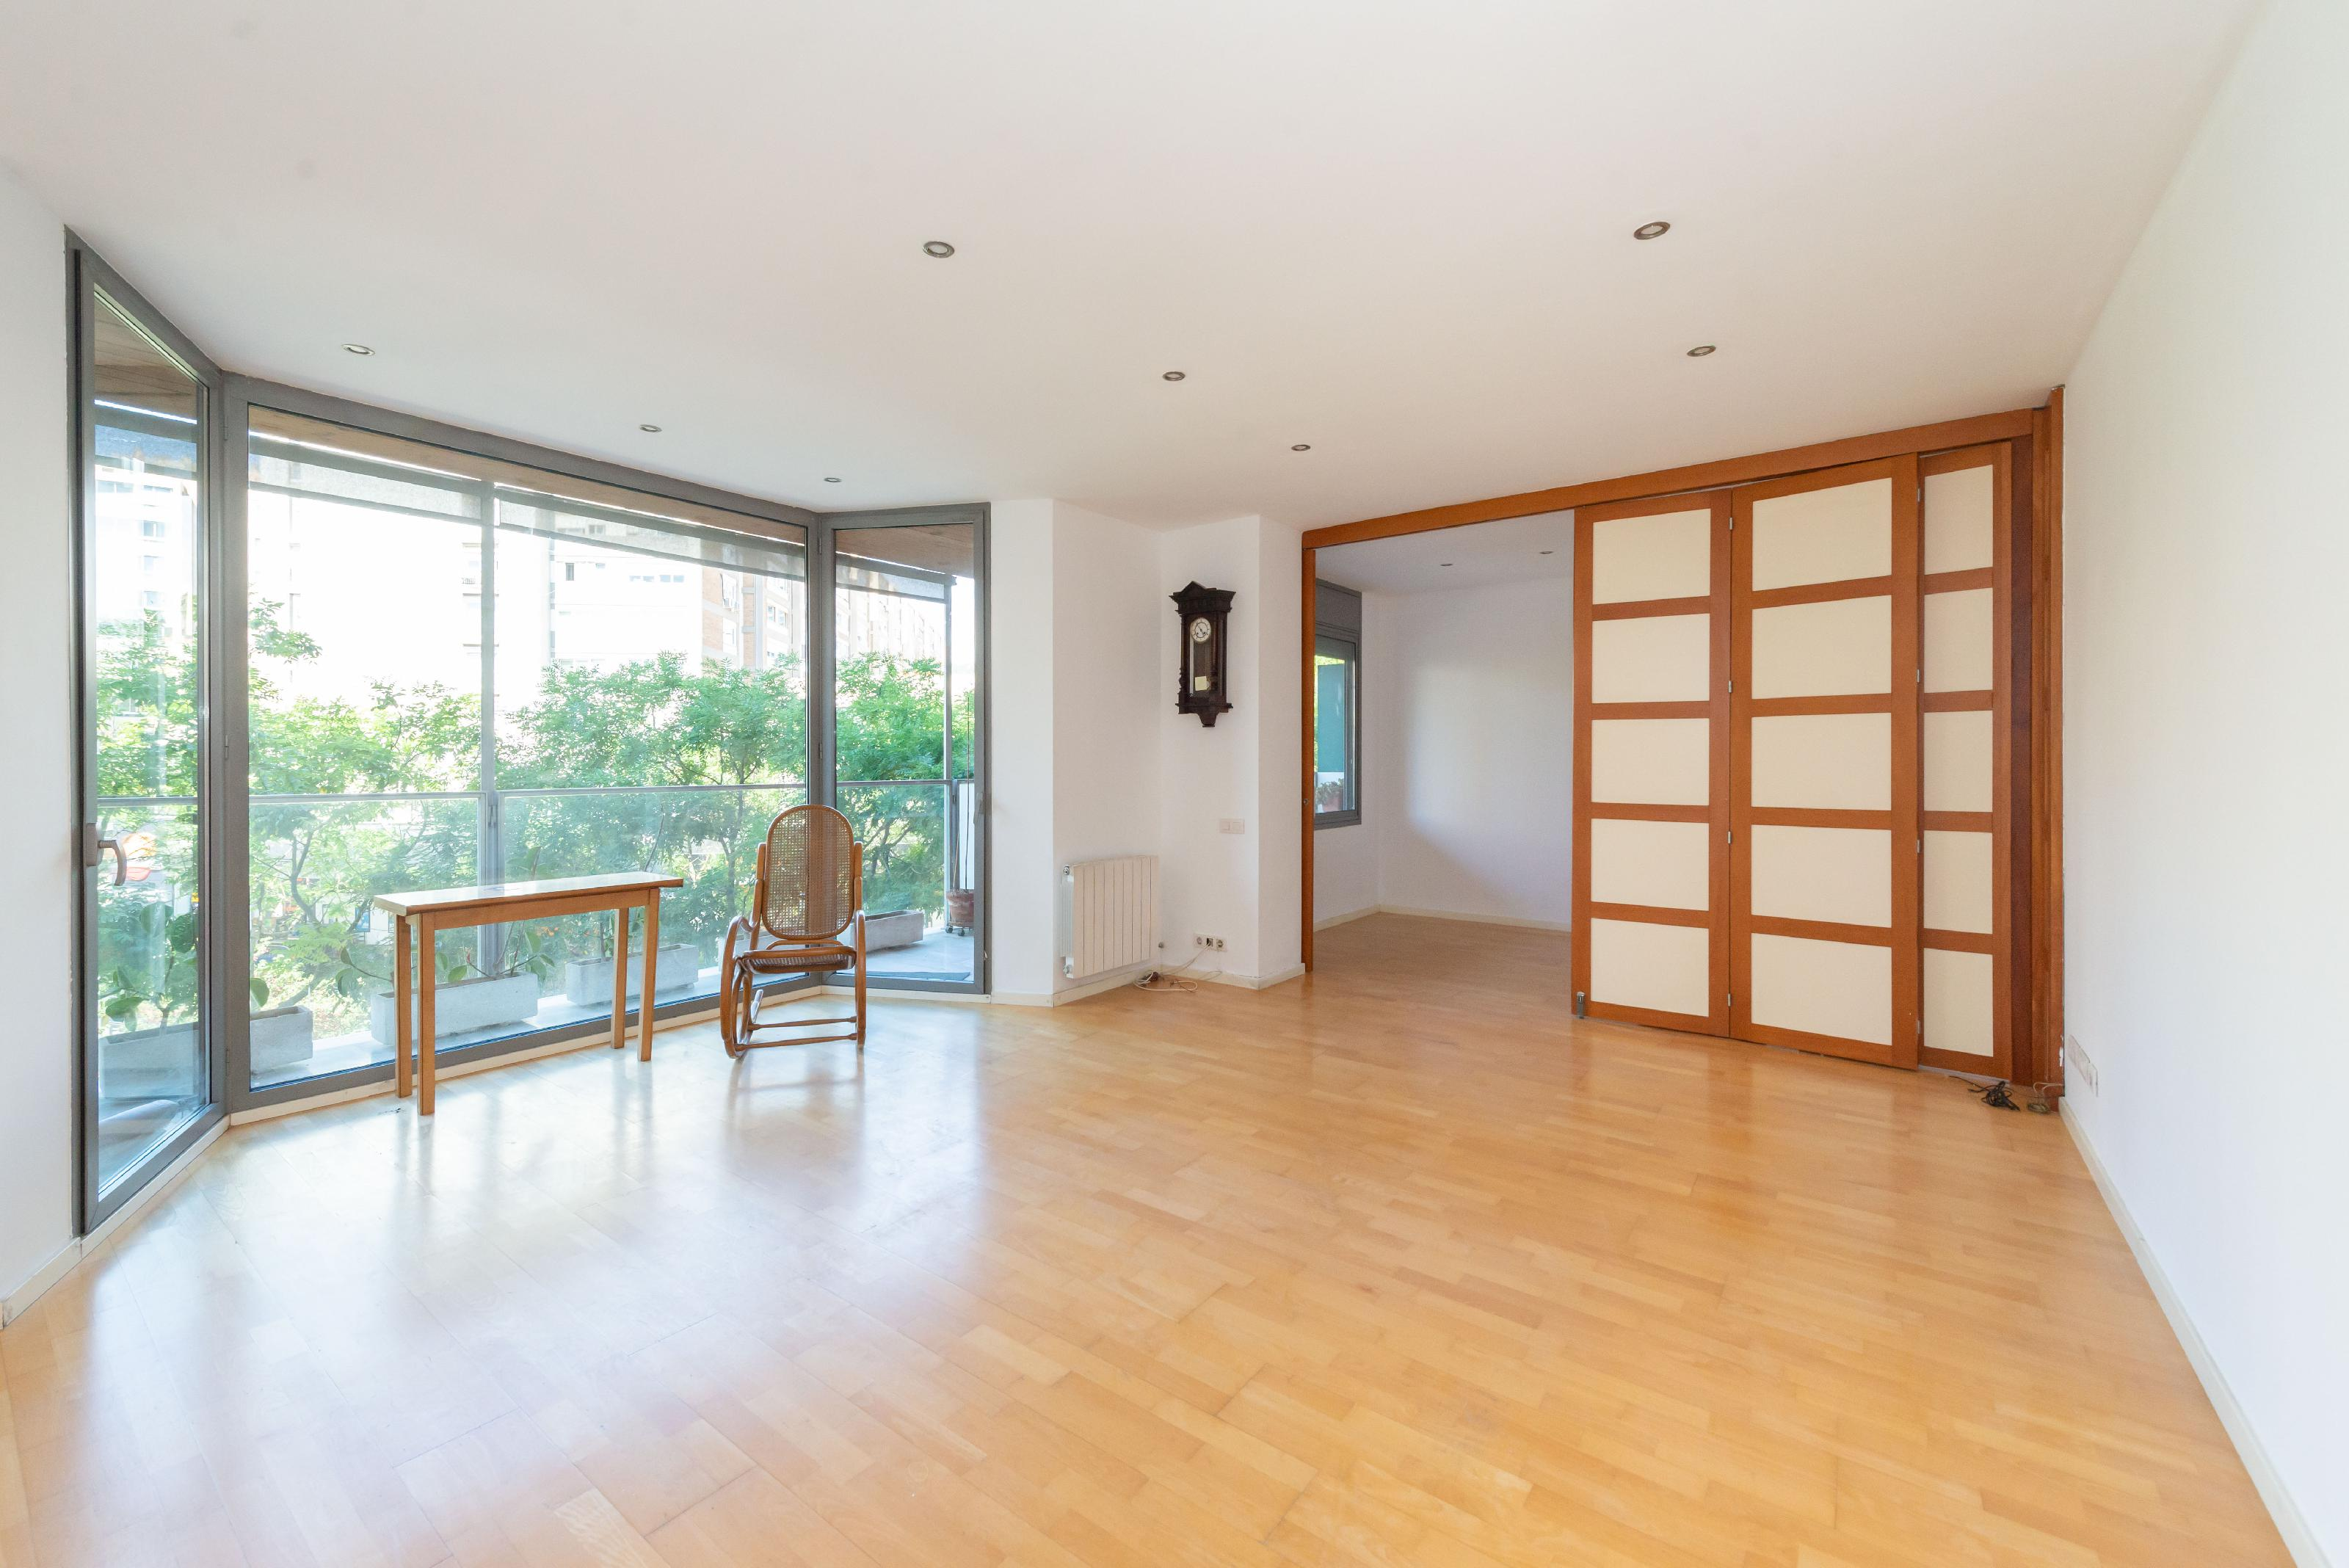 251446 Flat for sale in Sarrià-Sant Gervasi, Tres Torres 1